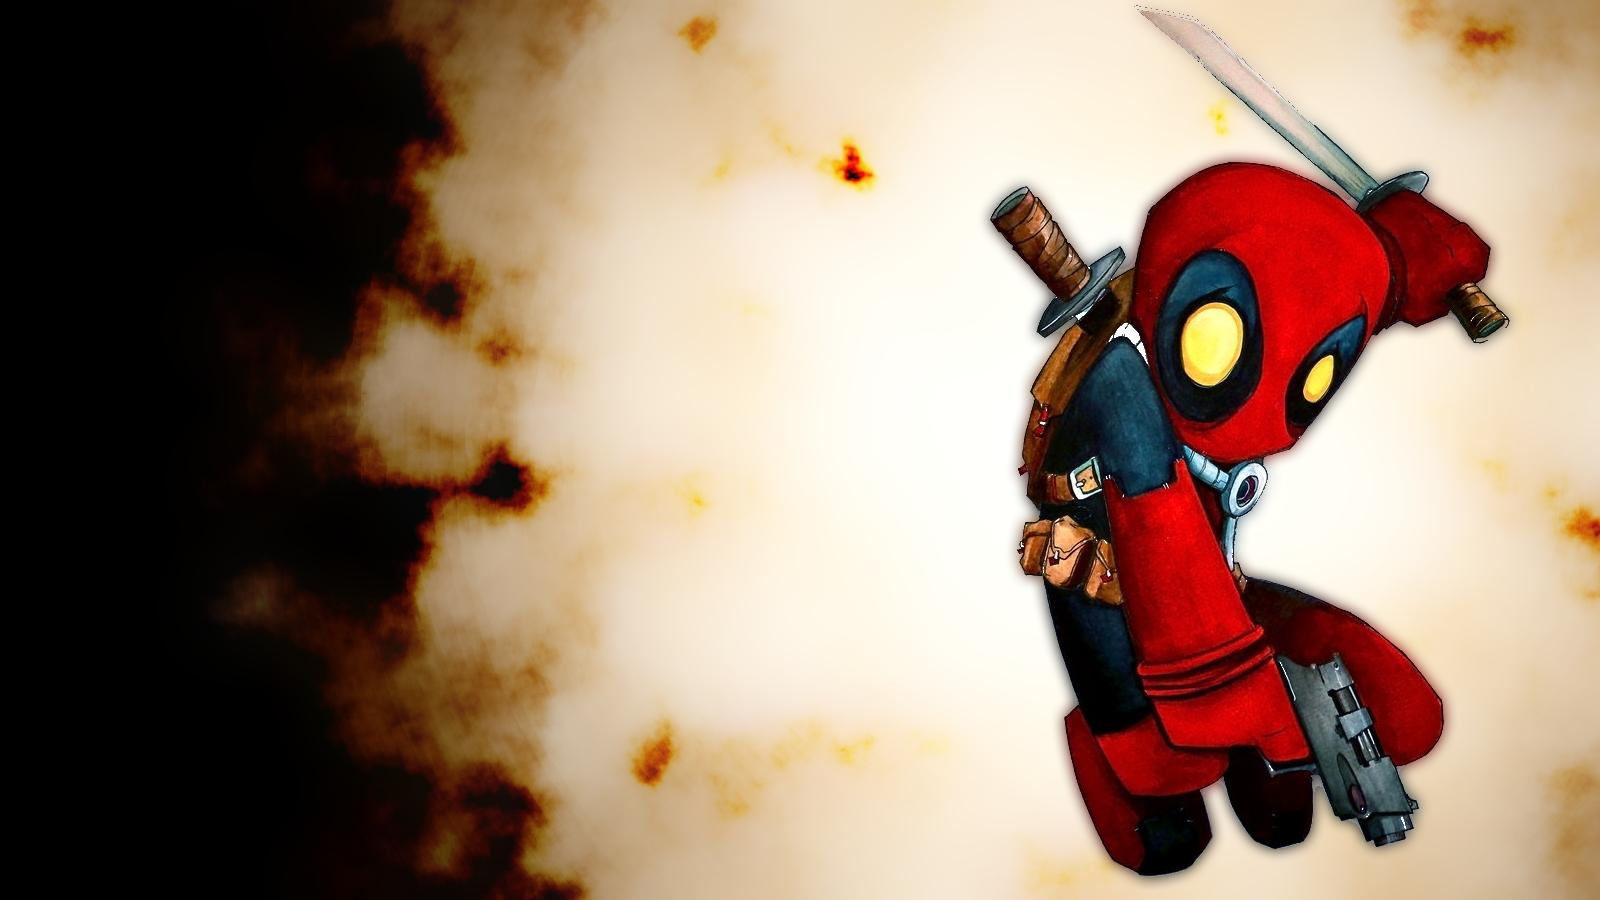 Deadpool Background Wallpaper ImageBankbiz 1600x900